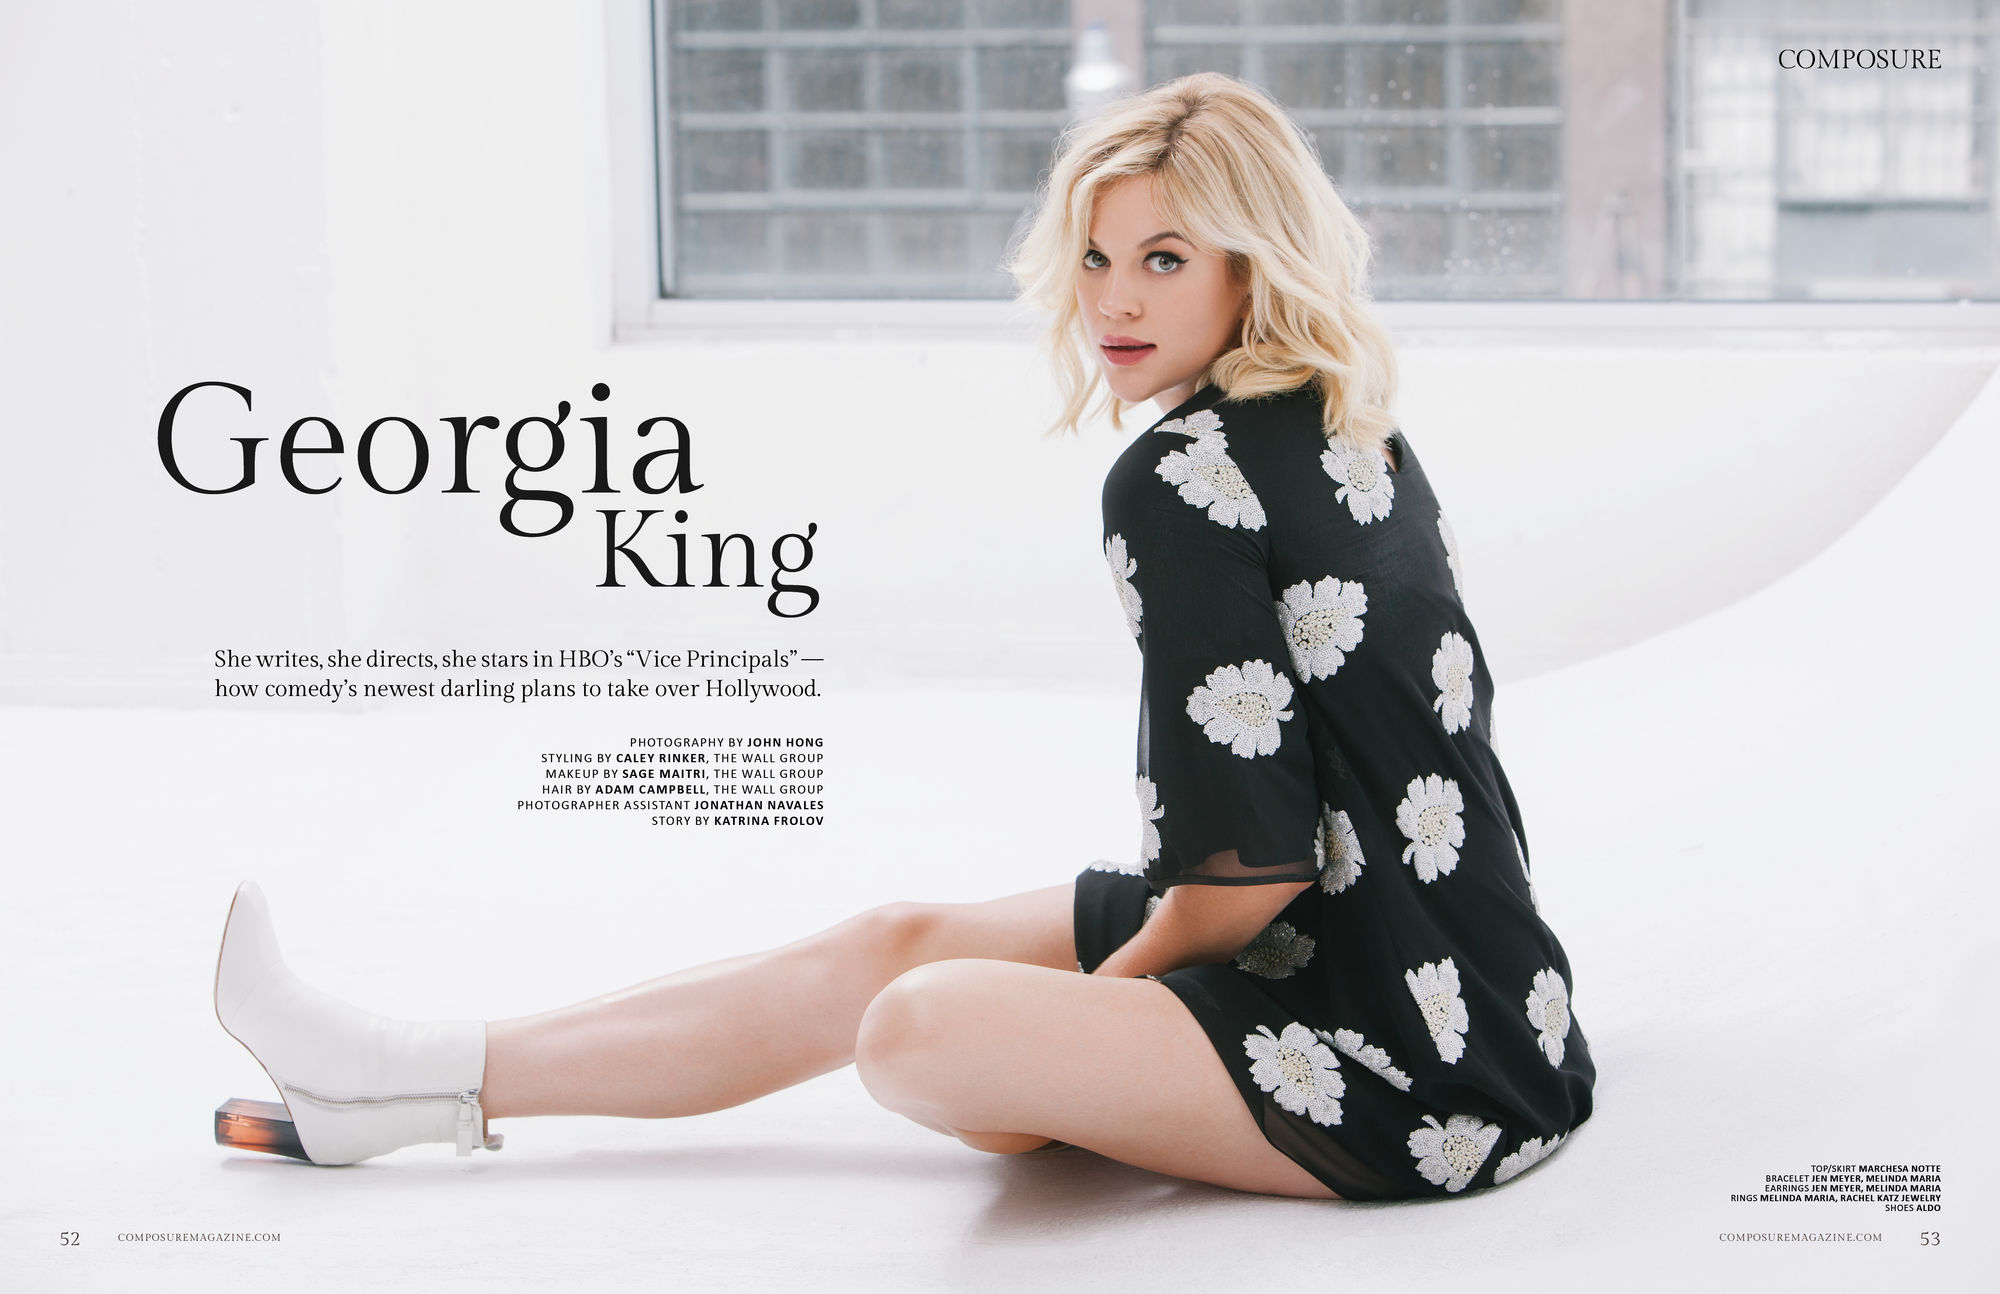 Georgia King